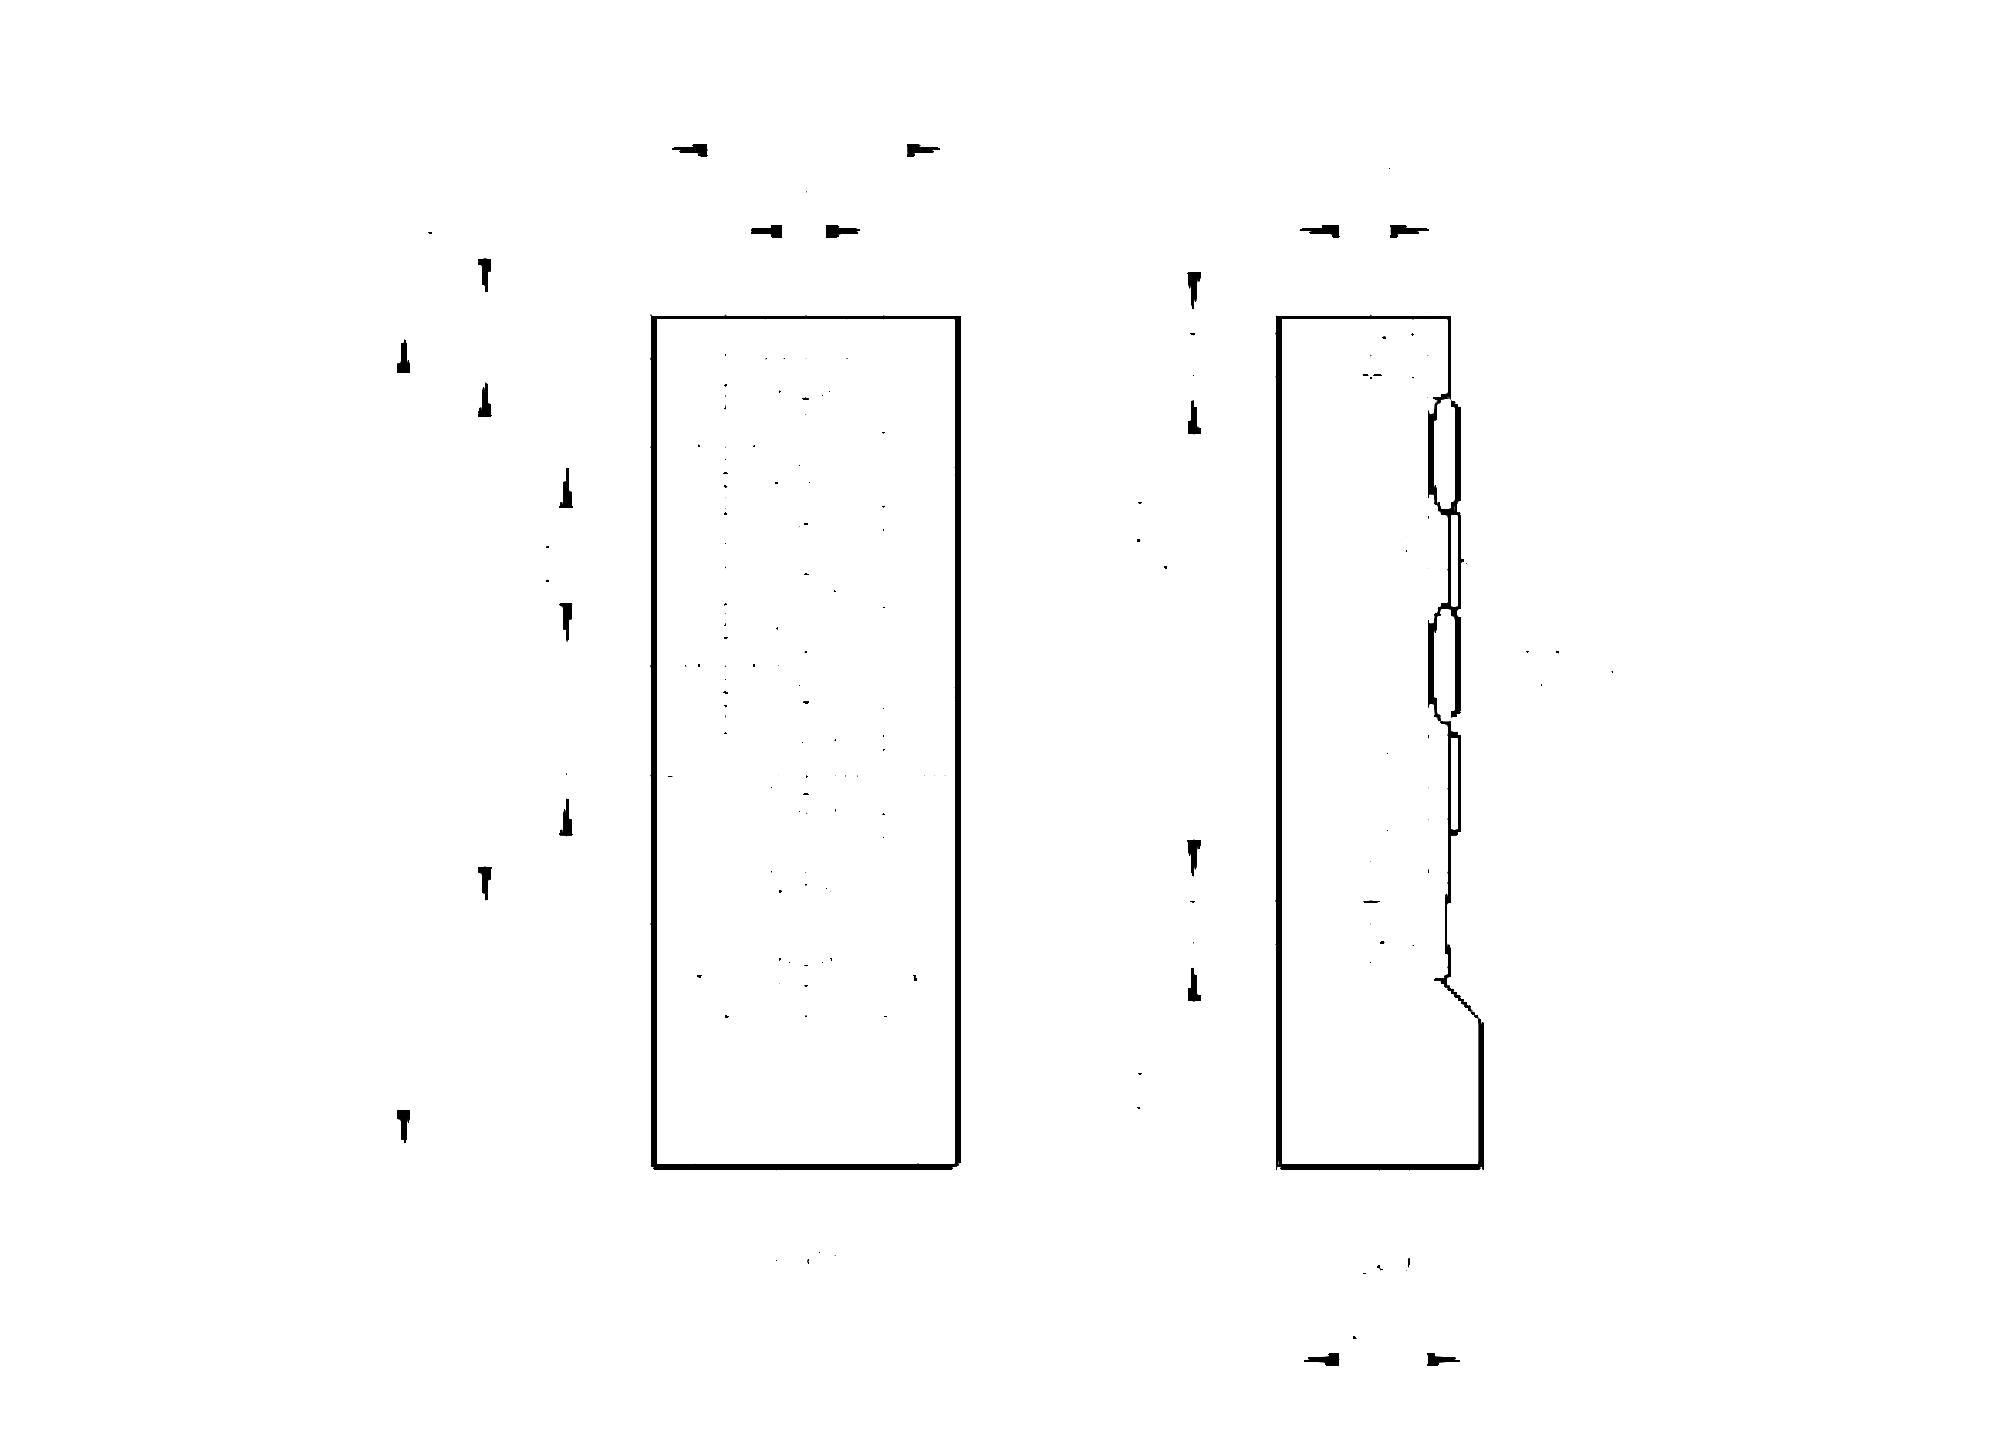 ebc051 - wiring block